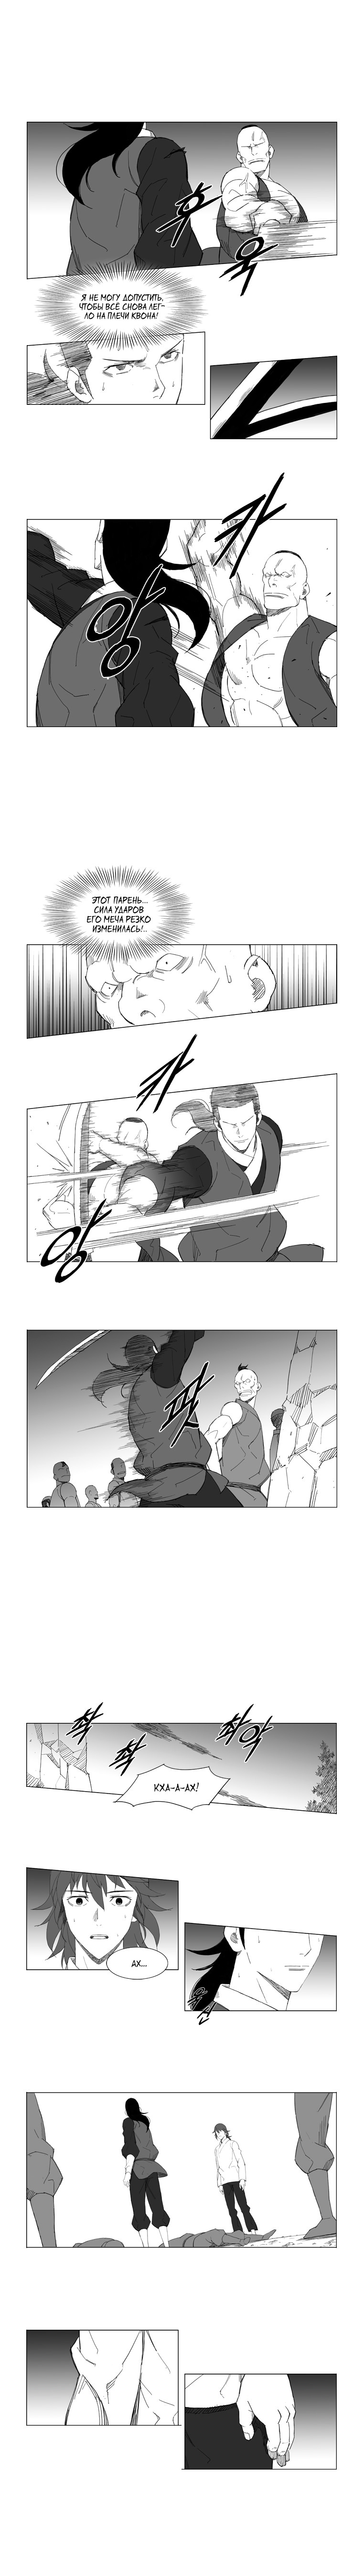 https://r1.ninemanga.com/comics/pic2/39/28263/331326/1502309155300.jpg Page 5